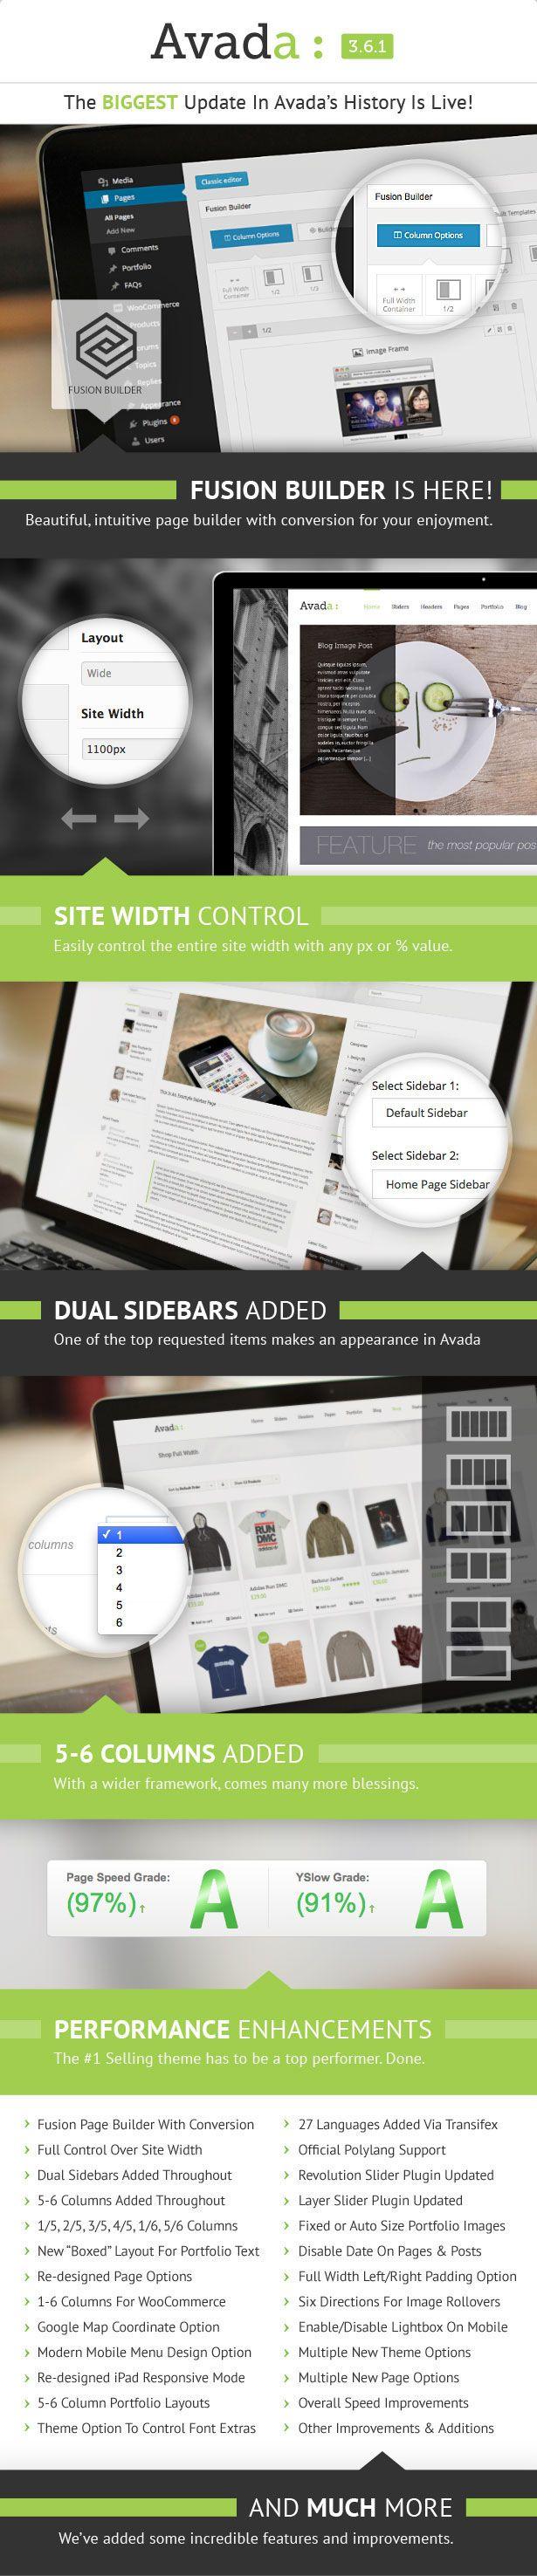 Avada | Responsive Multi-Purpose Theme on Behance